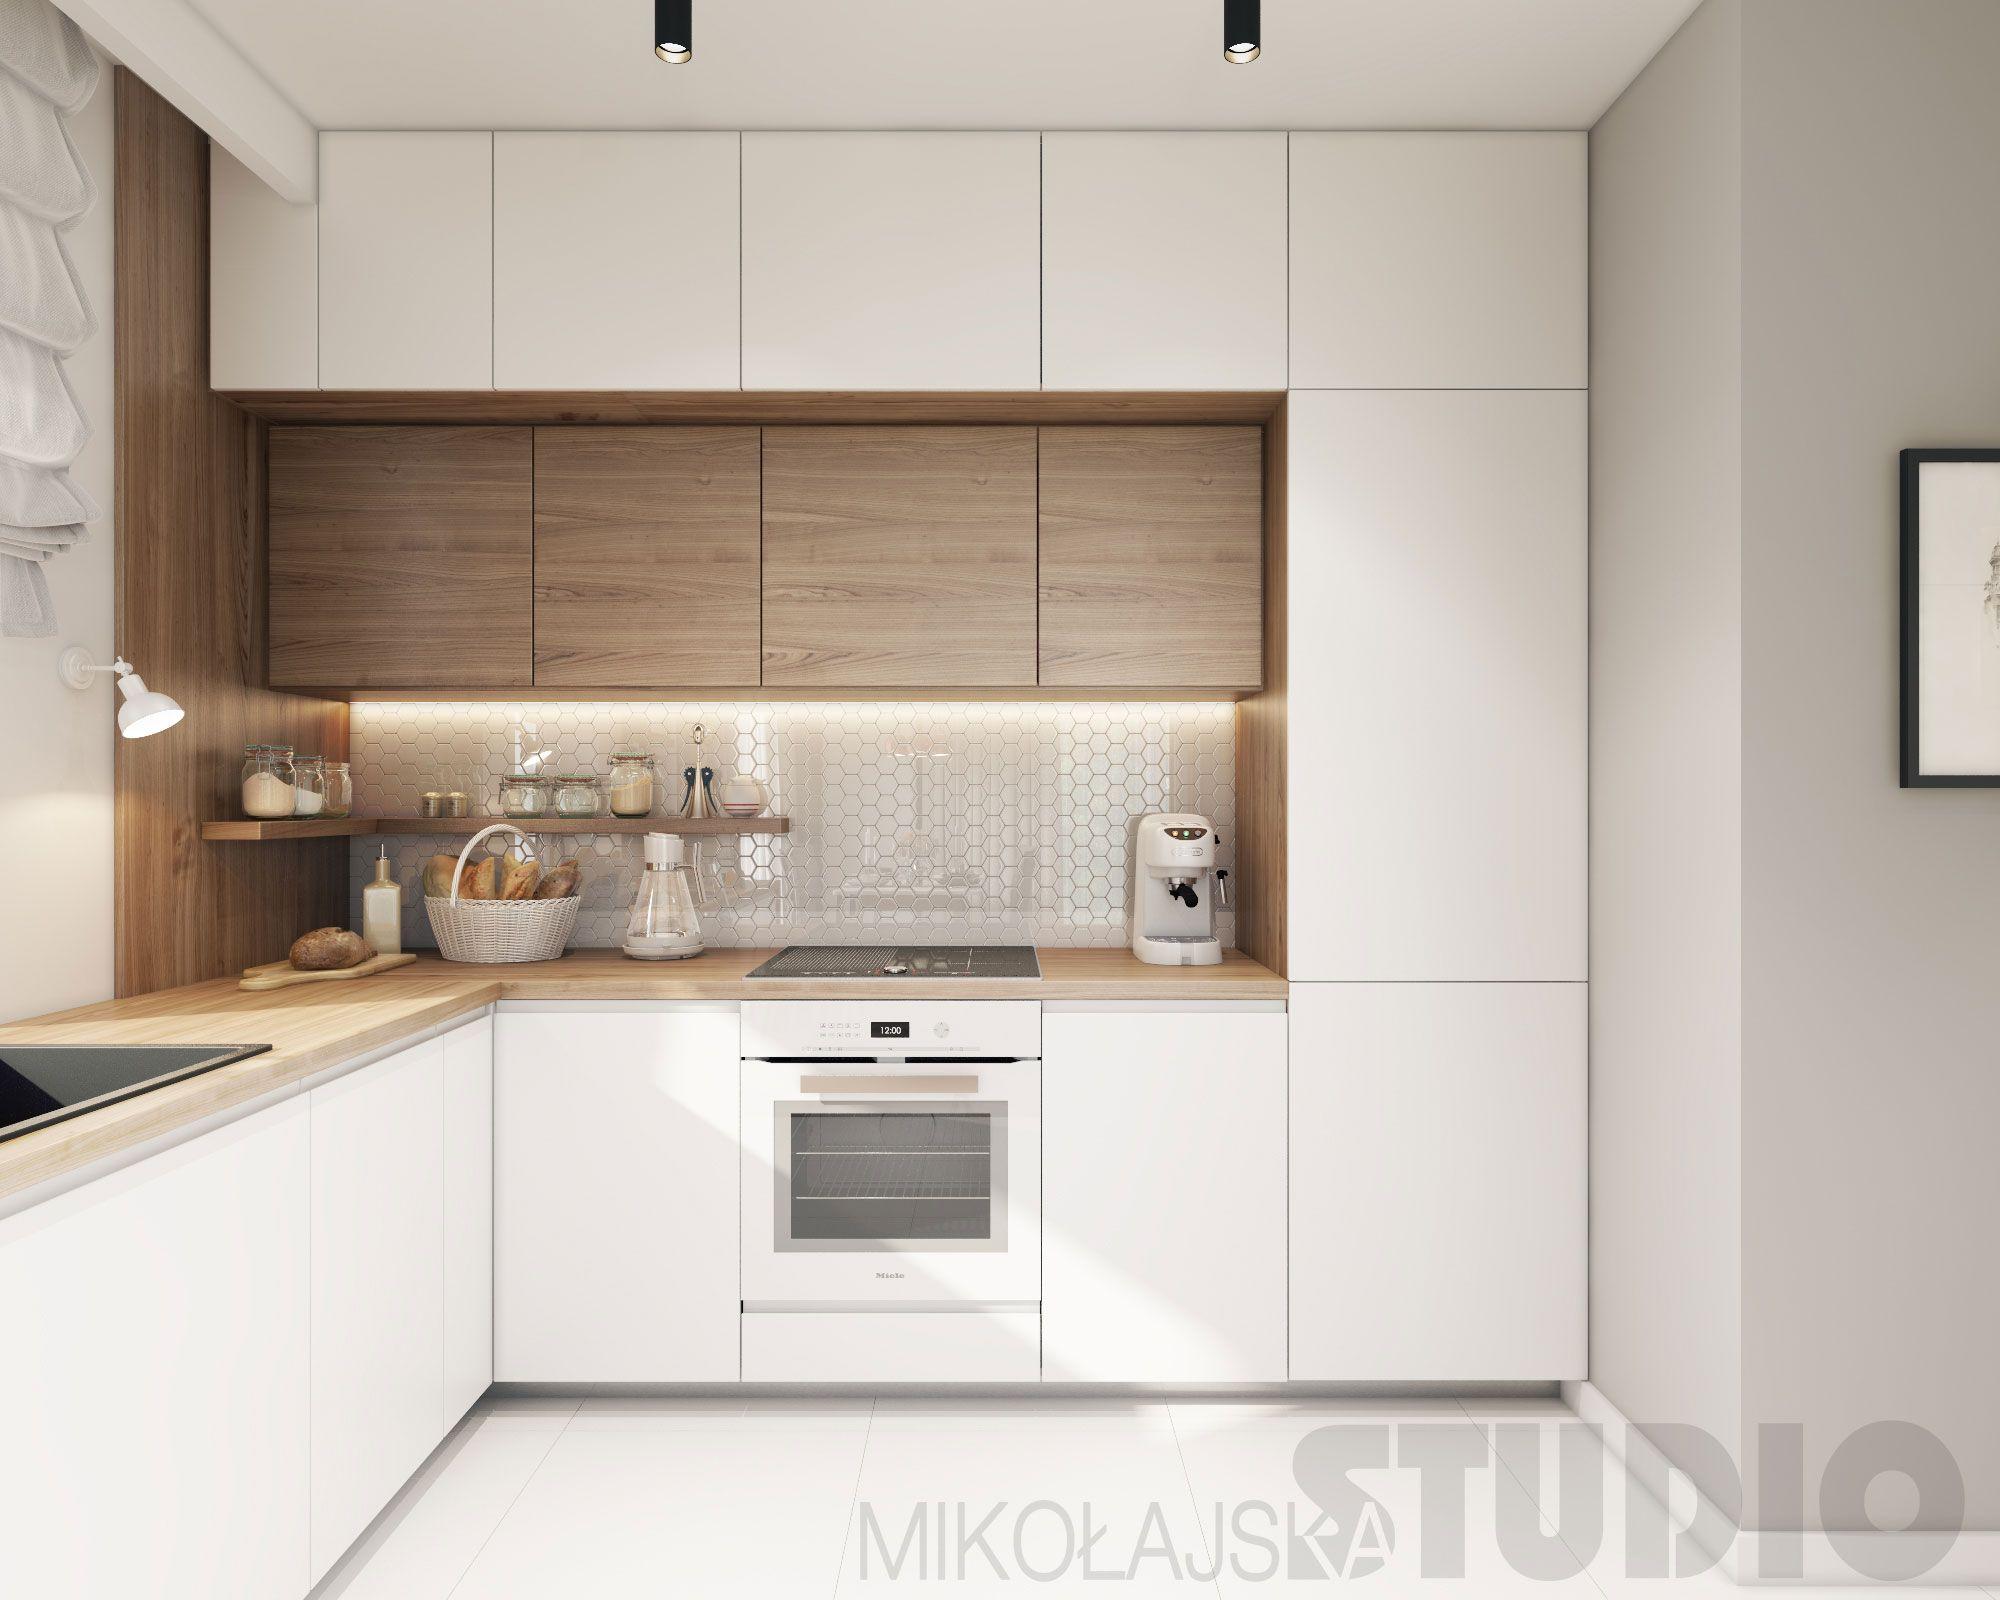 Biała Kuchnia  Кухня  Pinterest  Kitchens Interiors And Interesting Small Kitchen Interior Design Design Decoration